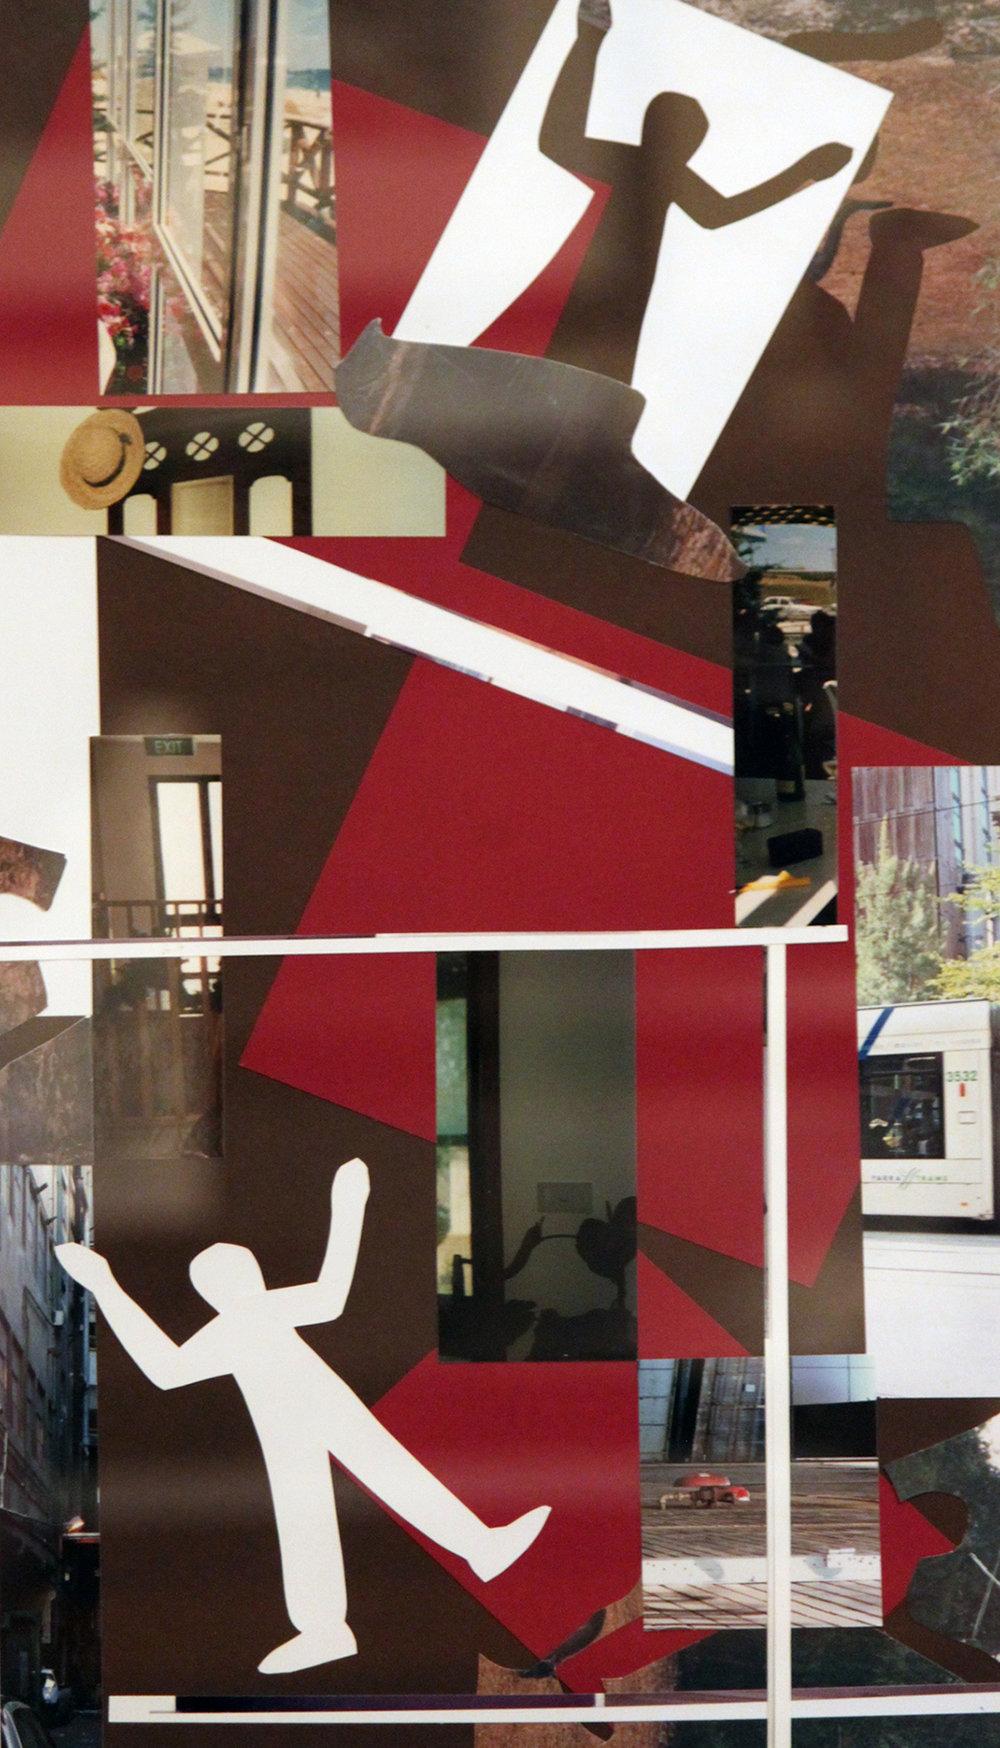 TITLE: Descending  MEDIUM: Collage on paper DIMENSIONS: H60 x W41cm  FRAMED